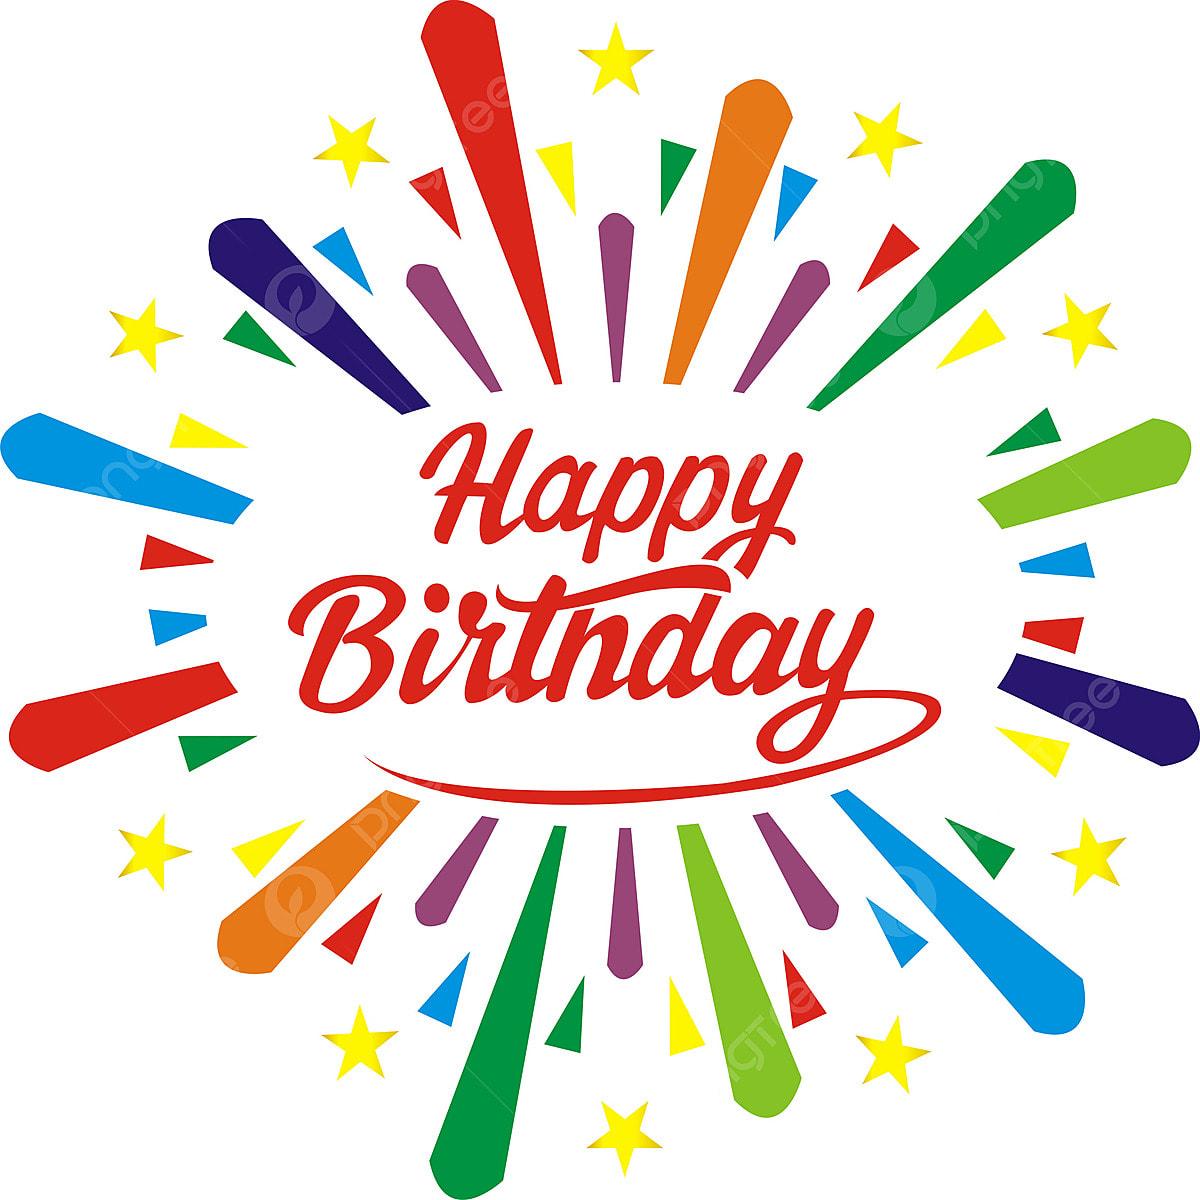 Selamat Ulang Tahun Kartu Ucapan Dengan Sunburst Dan Bintang